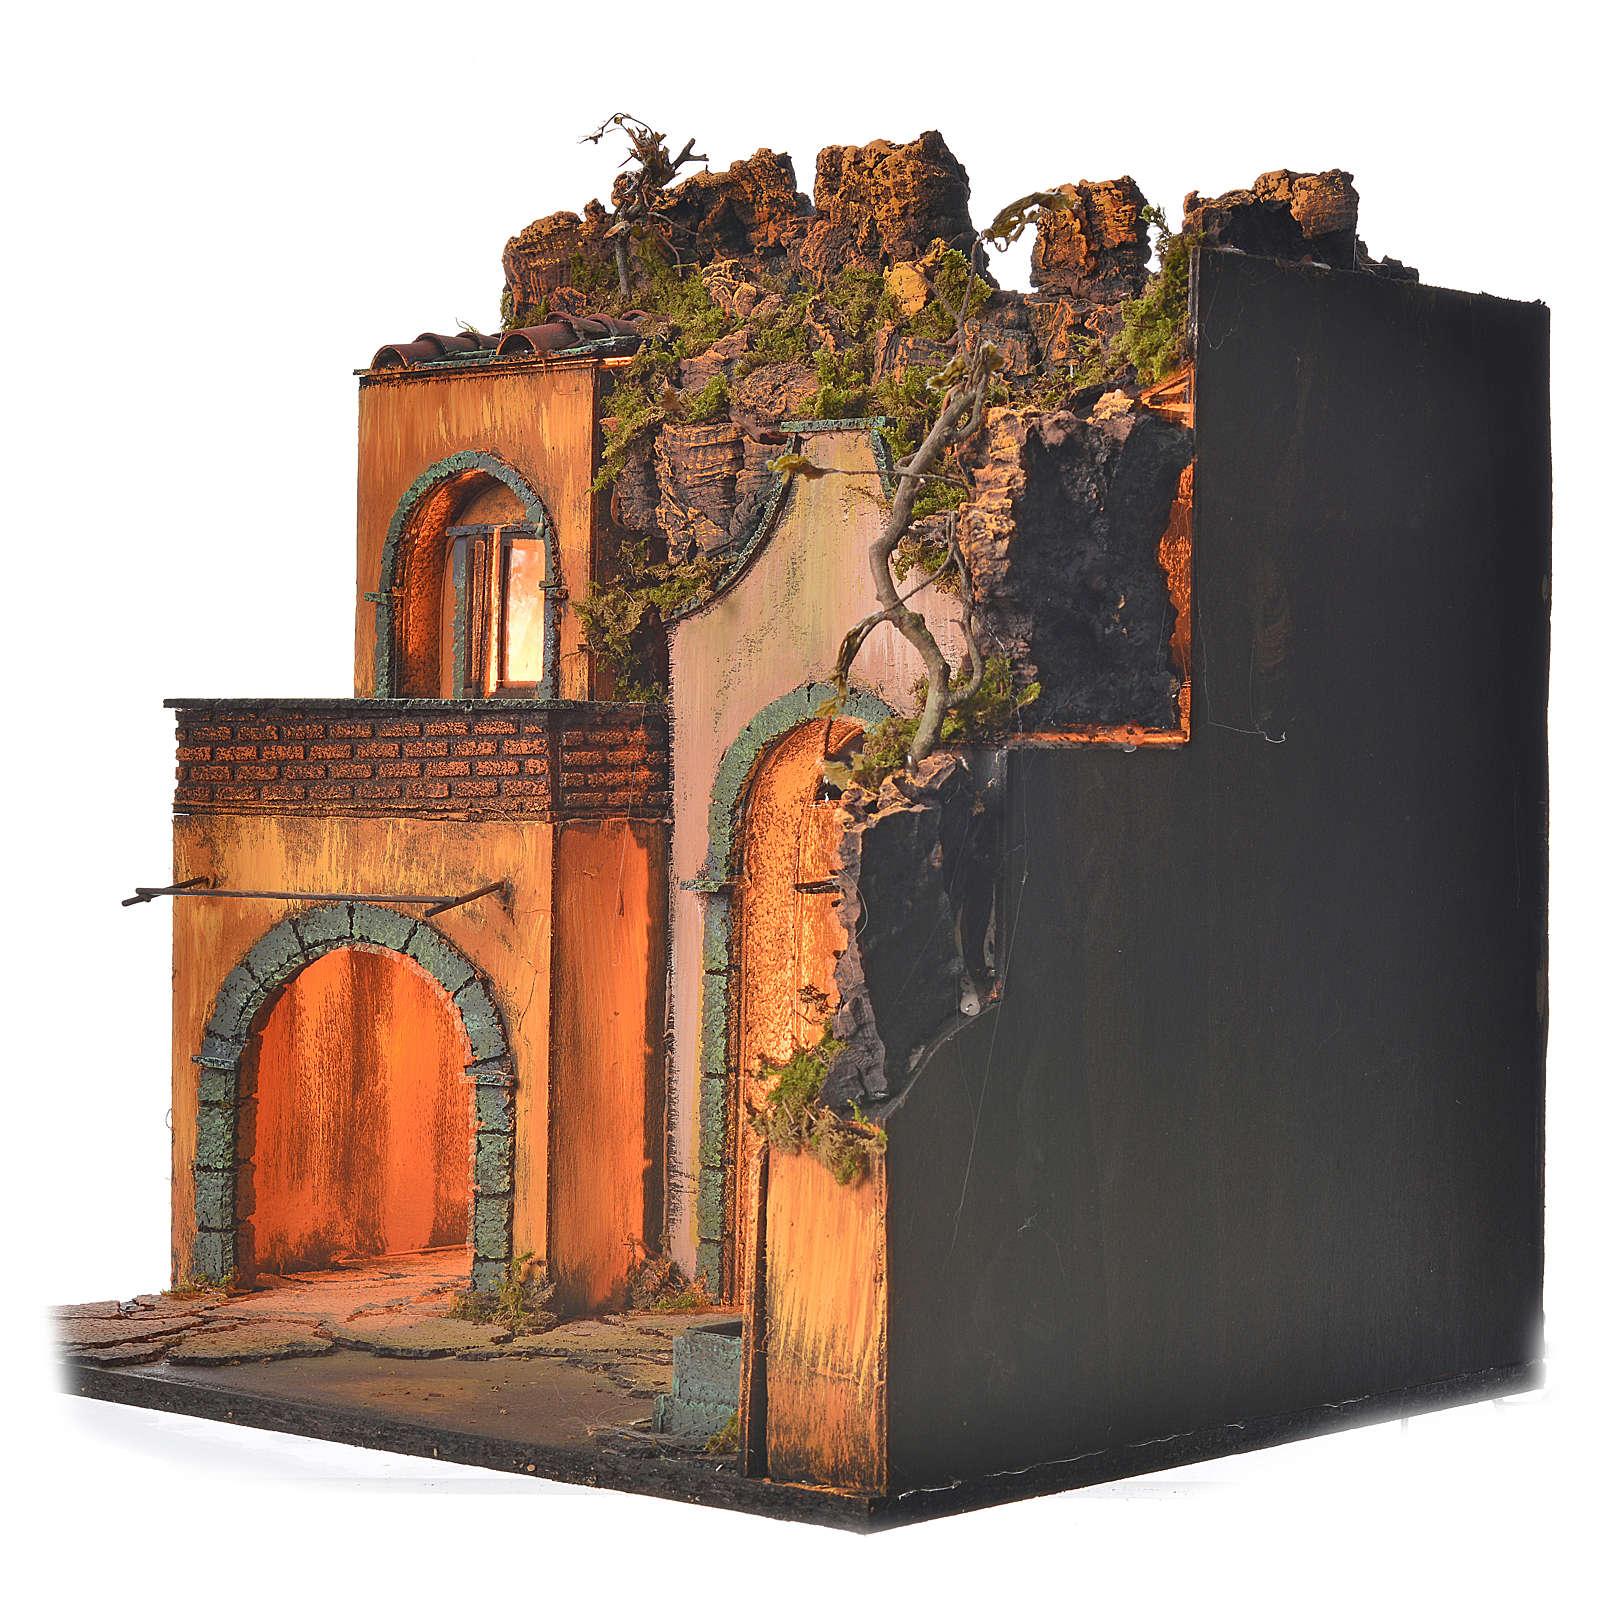 Borgo presepe napoletano stile 700 con arcata 4